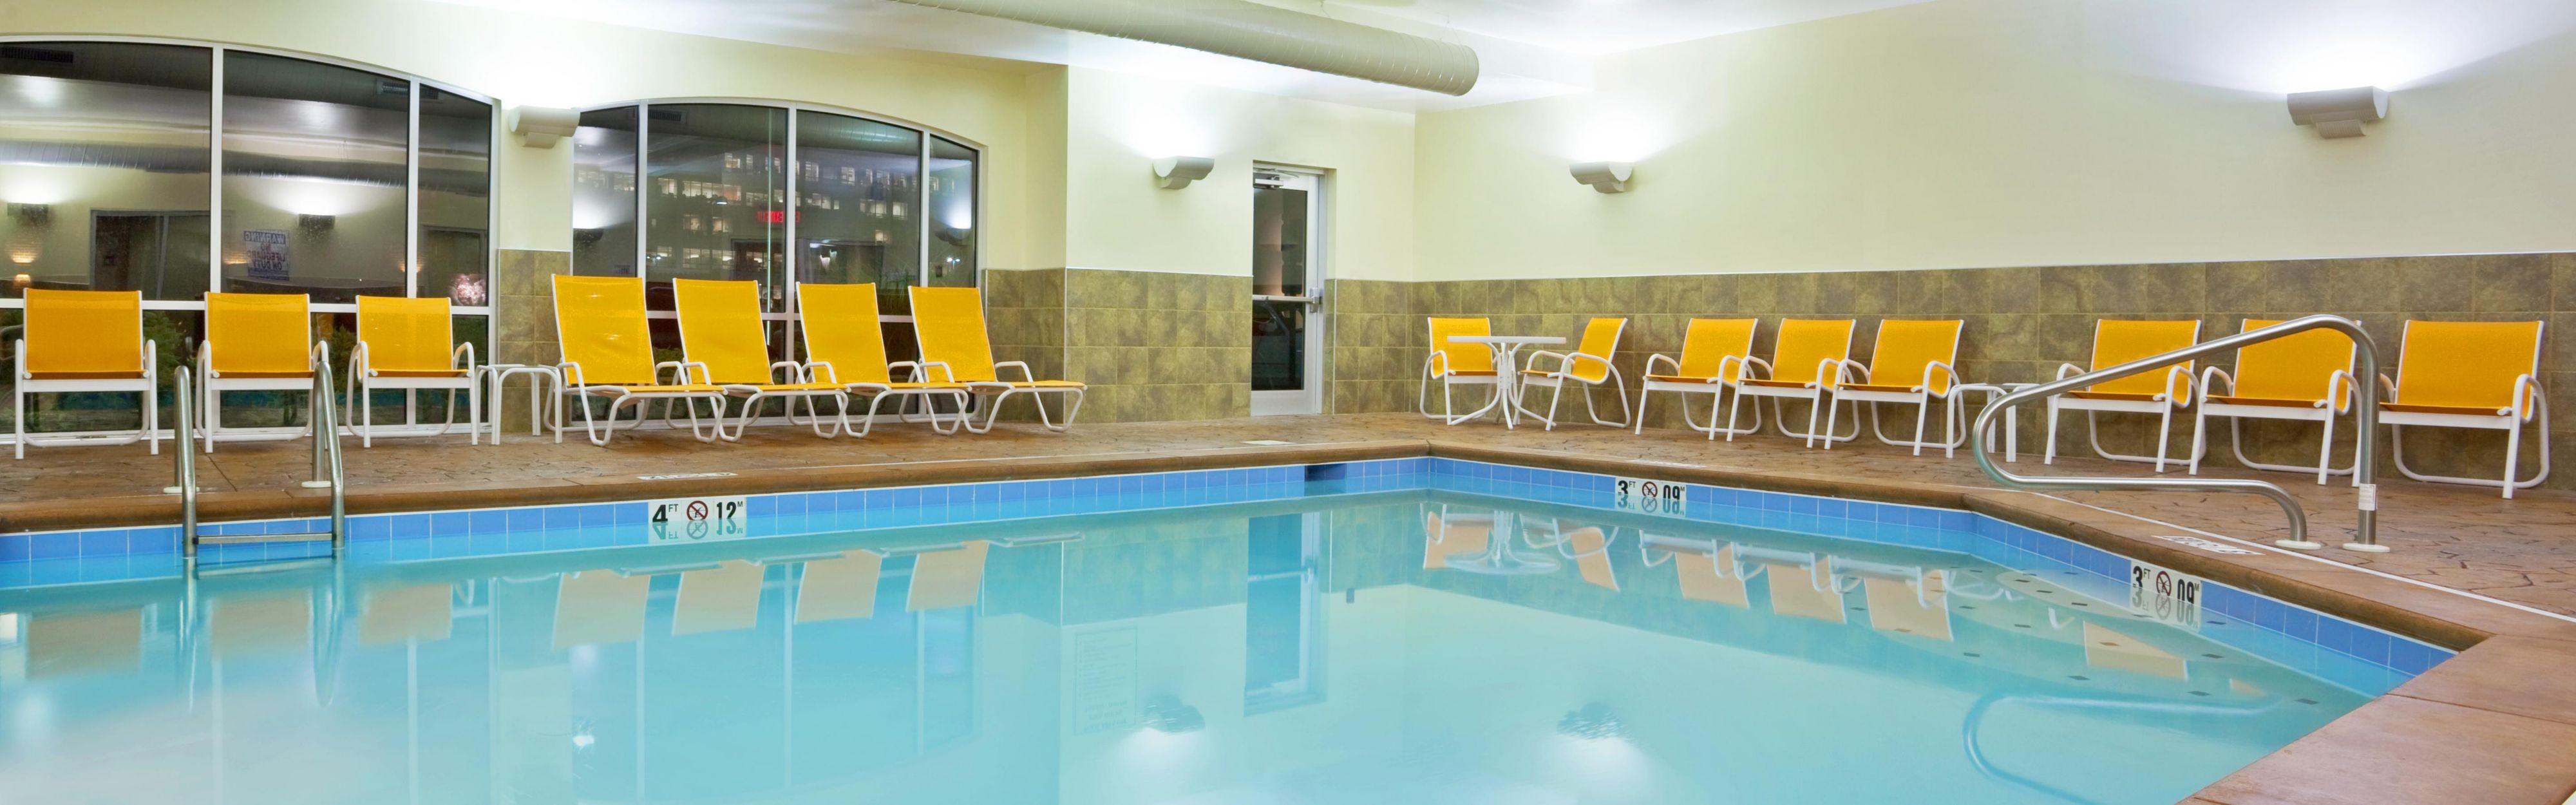 Holiday Inn Express Suites Cincinnati Mason Mason